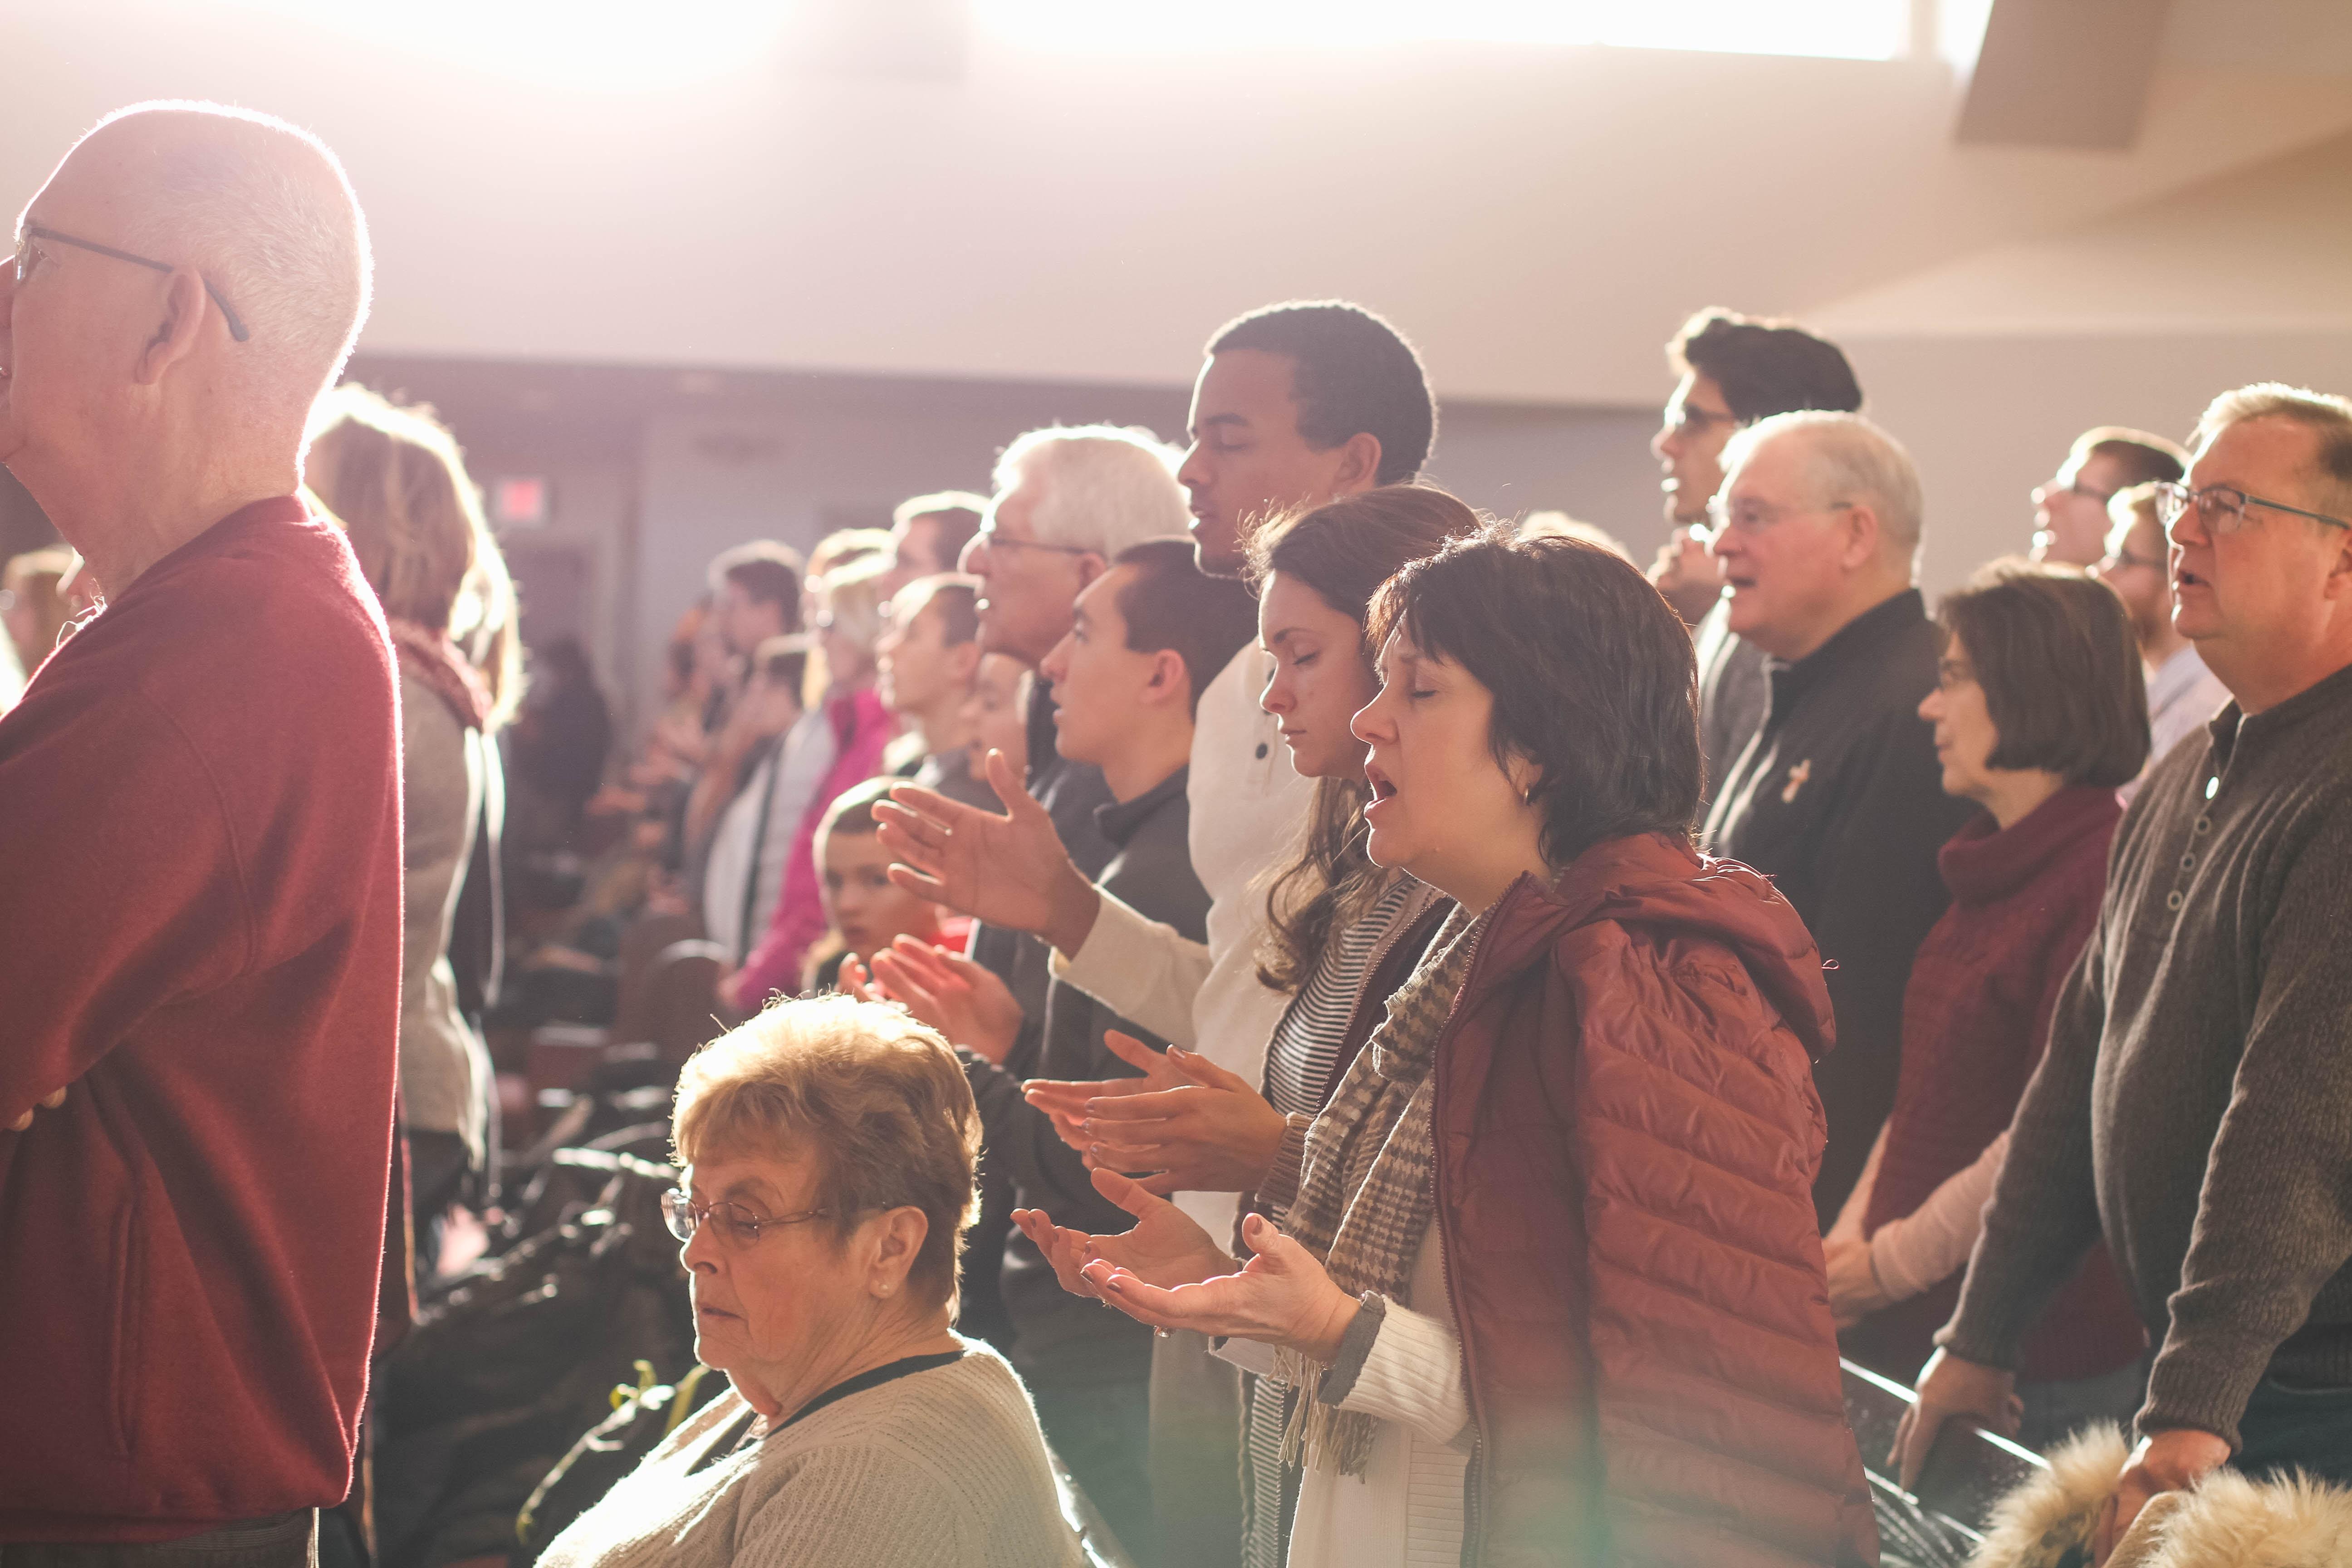 people worshiping god inside church